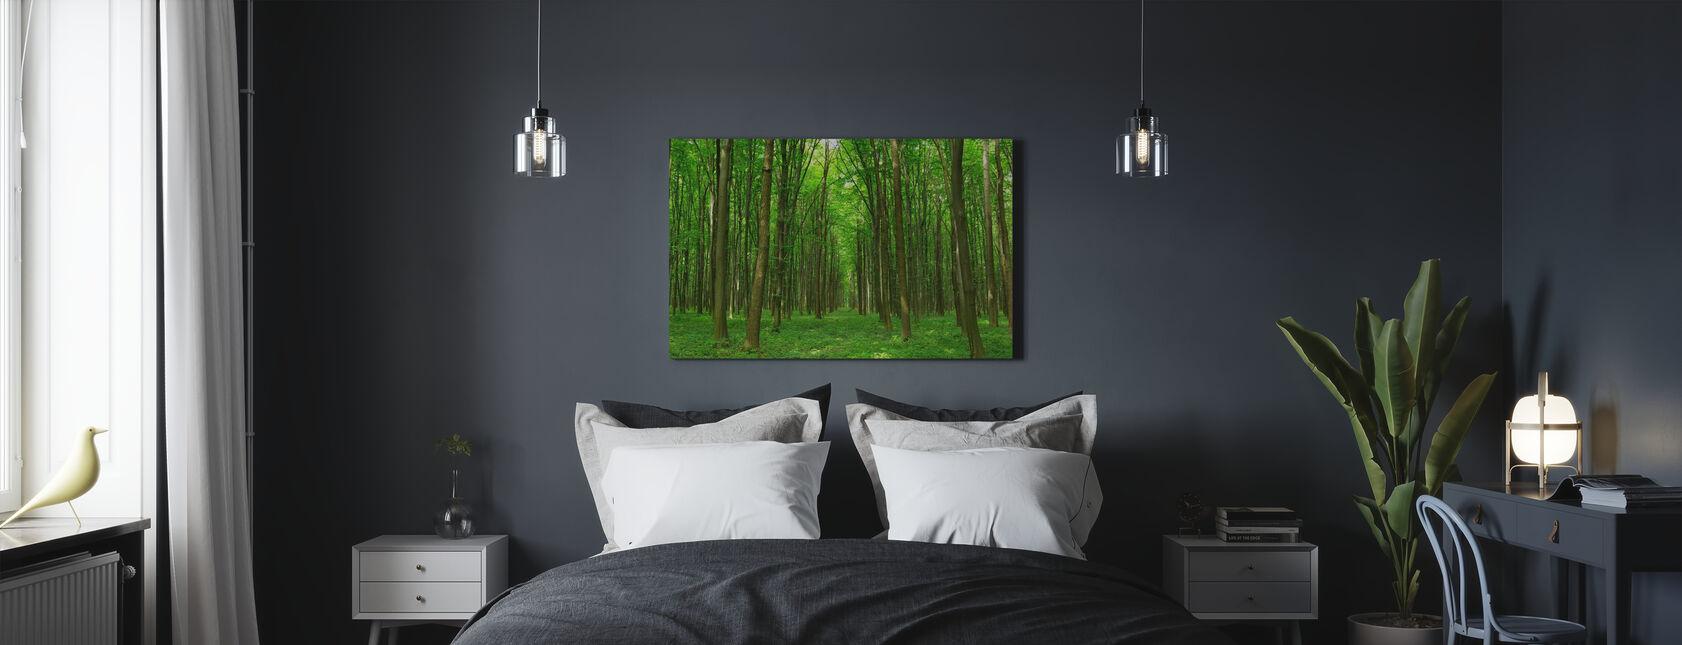 Green Passage - Canvas print - Bedroom